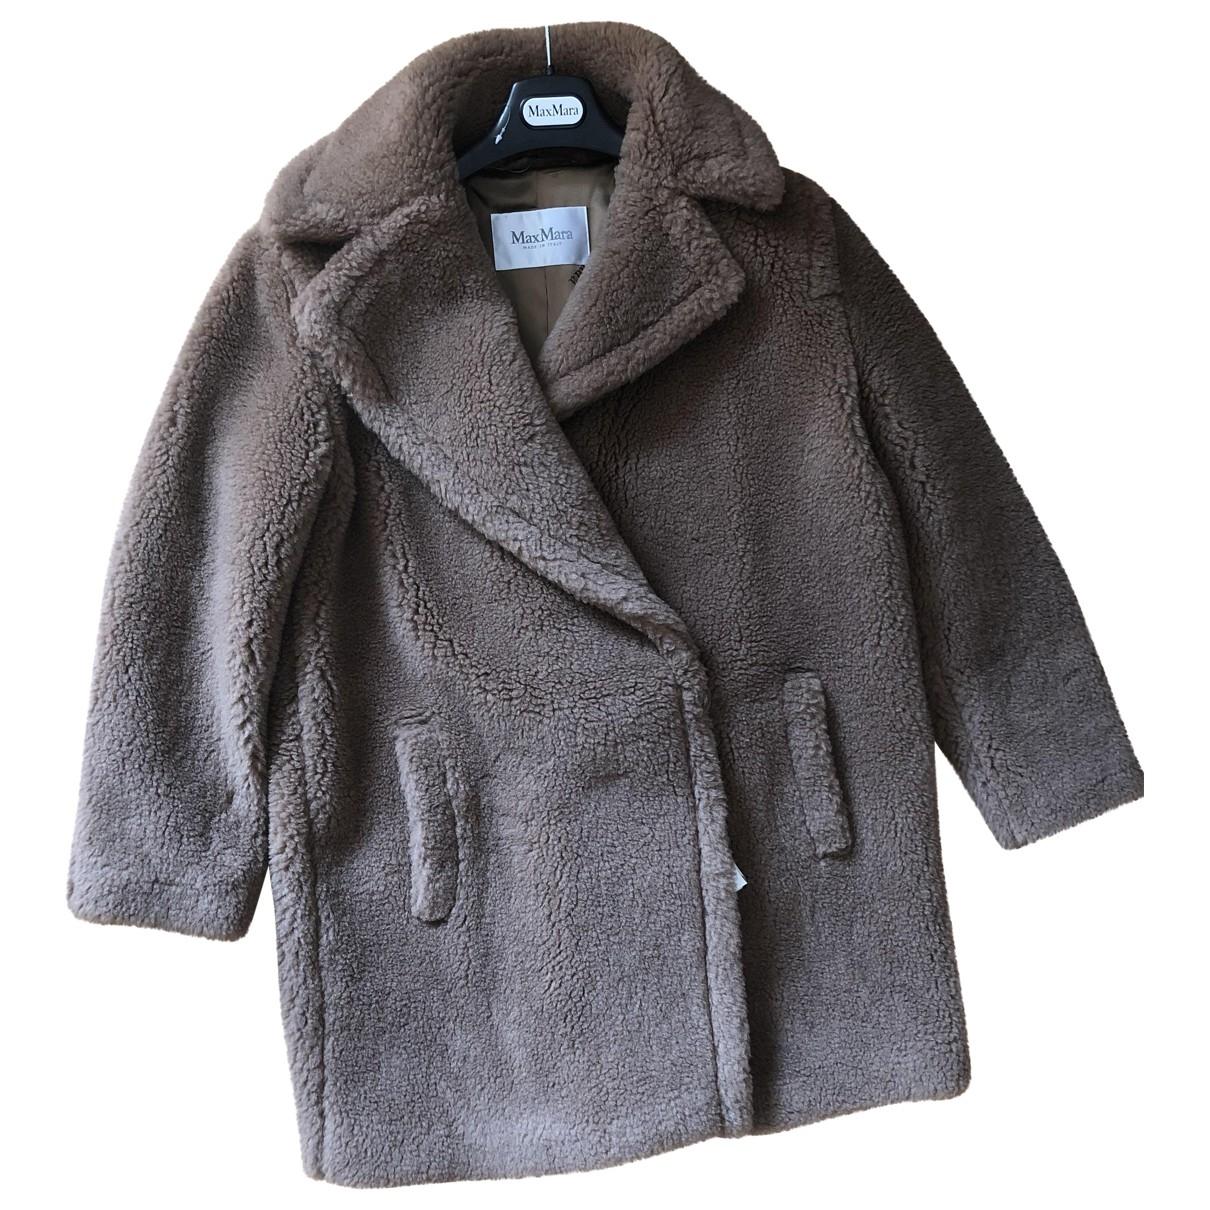 Max Mara - Manteau Teddy Bear Icon pour femme en laine - marron